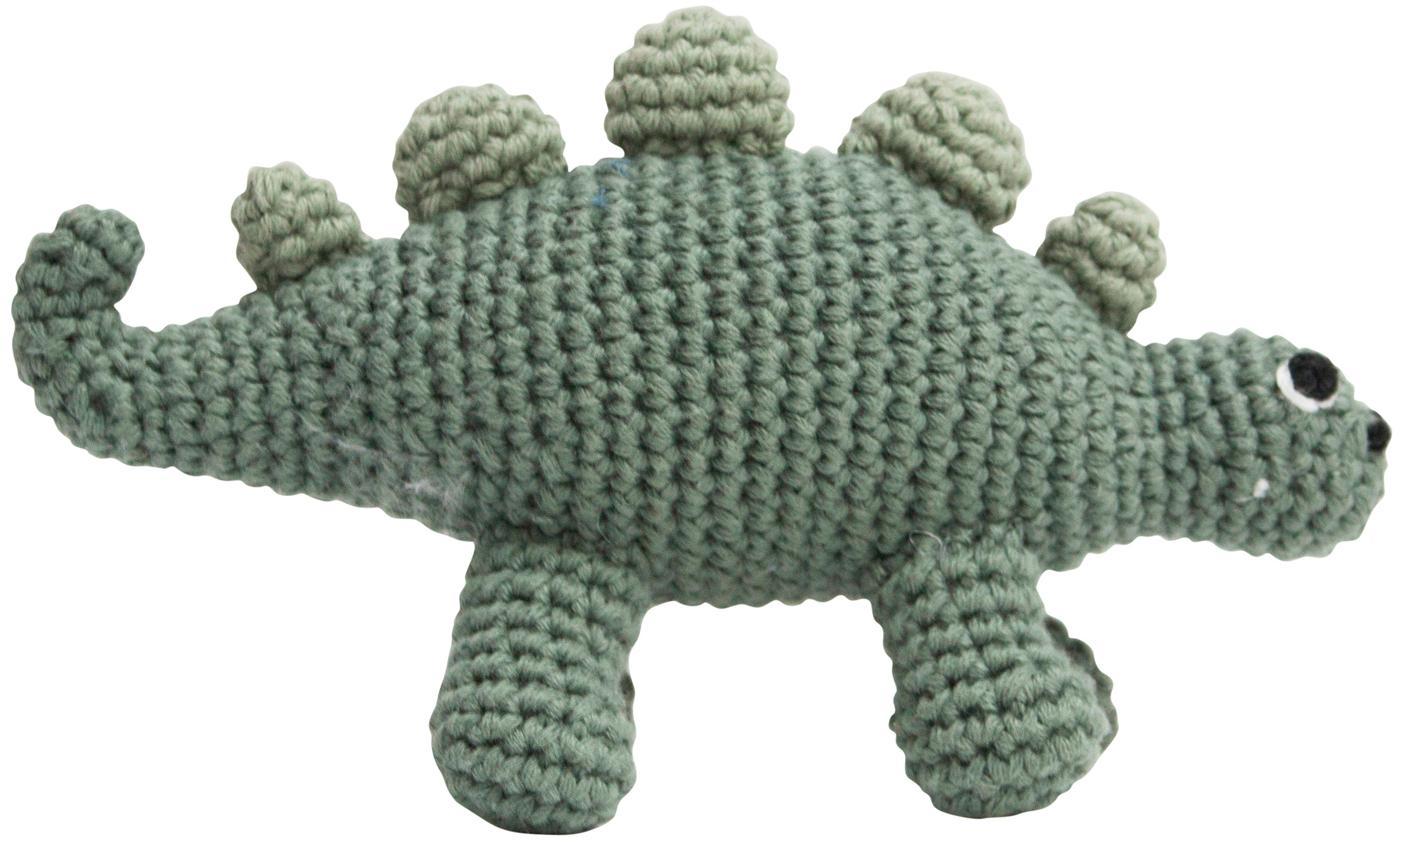 Peluche ad uncinetto Dinko, Rivestimento: cotone, Verde, Larg. 16 x Alt. 9 cm